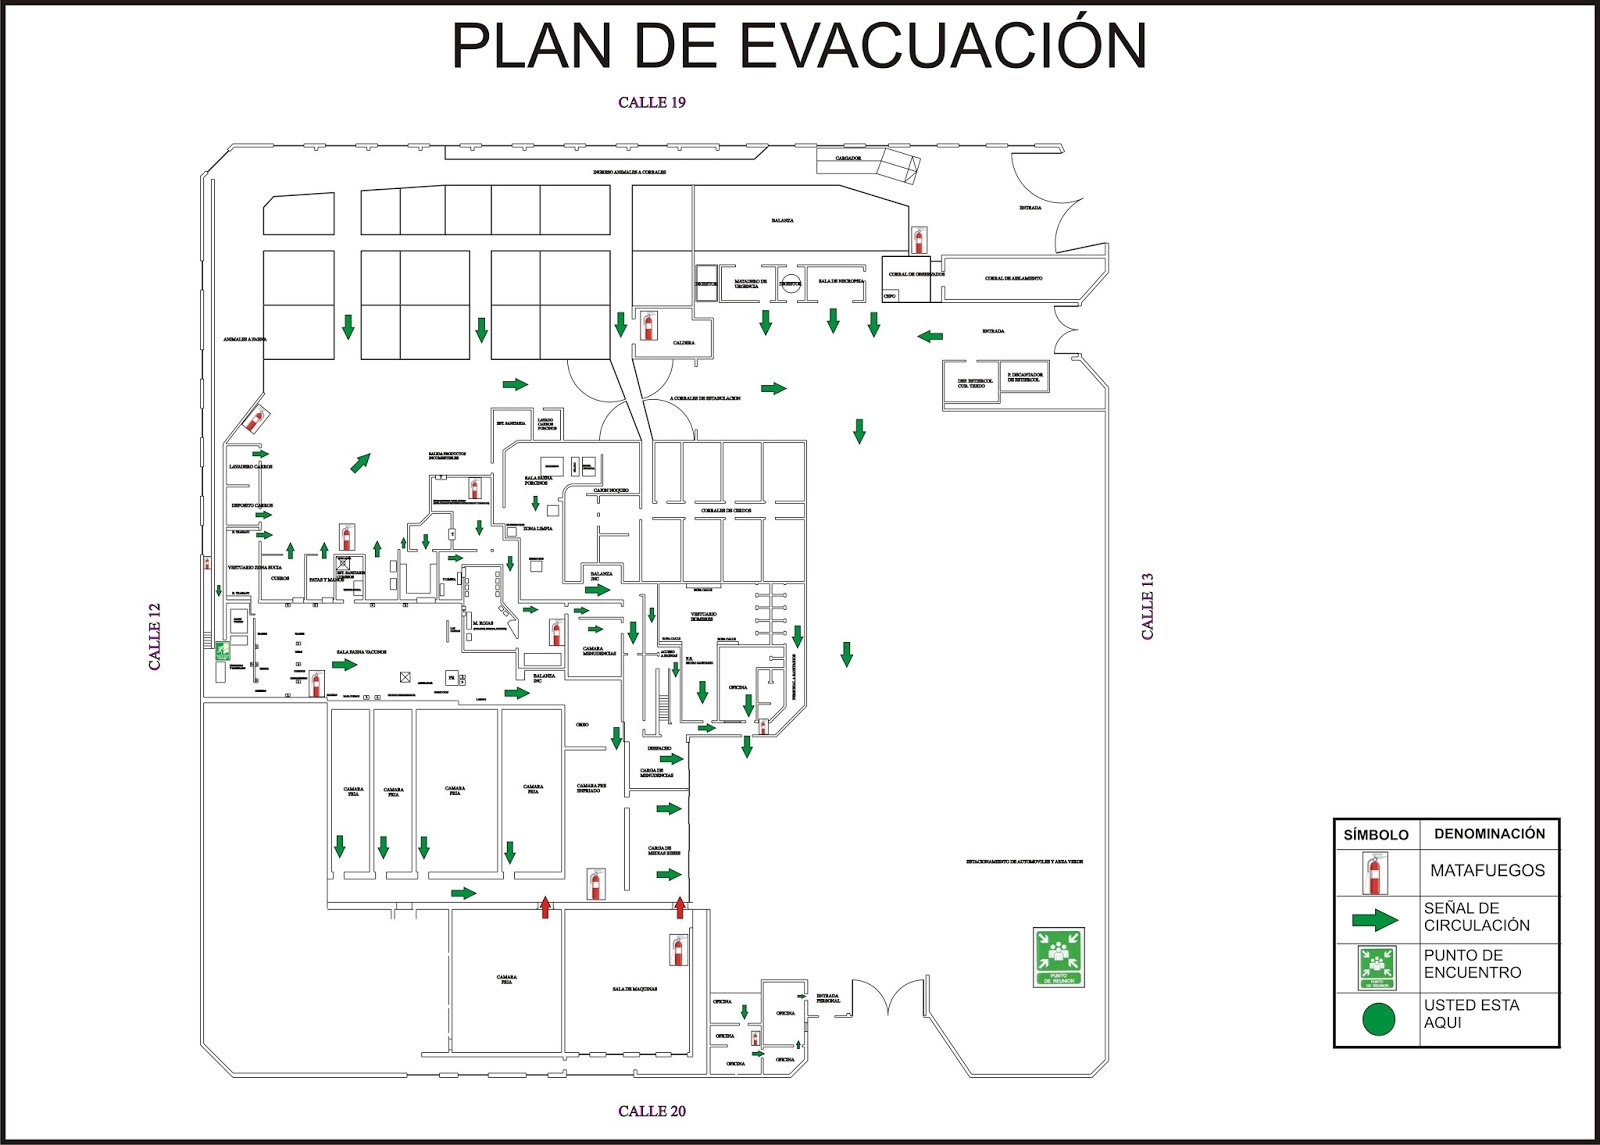 Mapa Plano Con Pin Icono De Puntero De La: Plano De Evacuacion. Fabulous Pin It Plano De Evacuacin Y